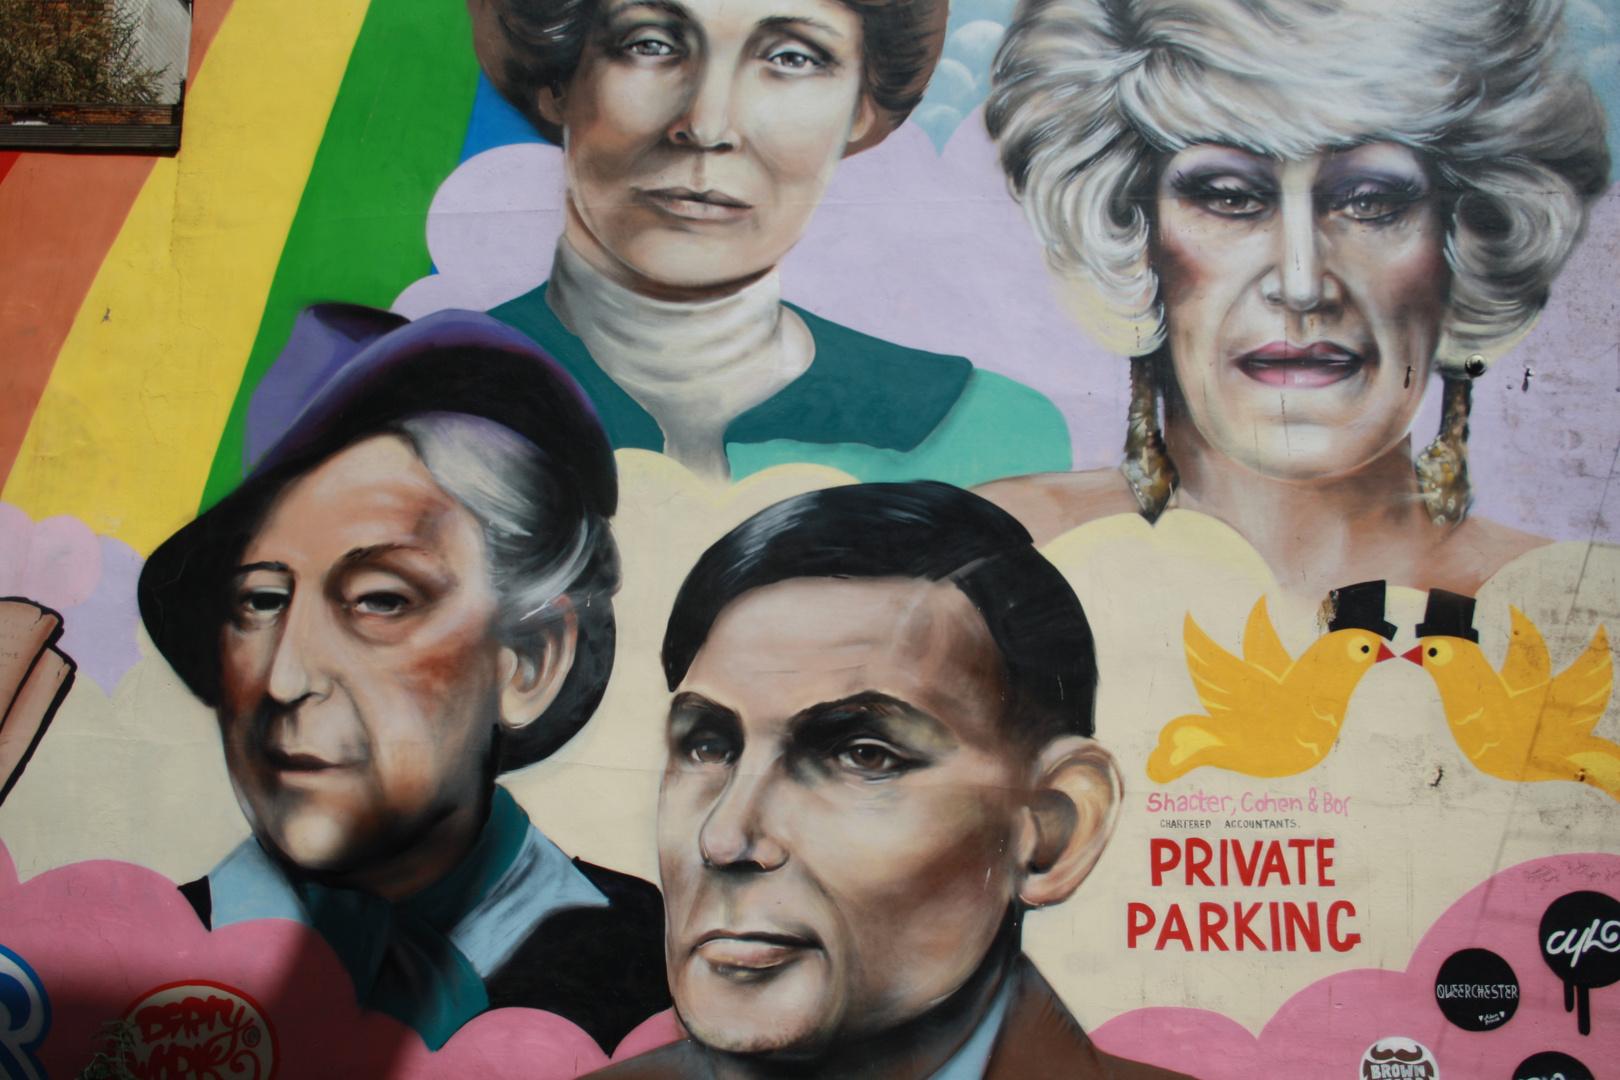 Gaurdians of Manchester on a car park